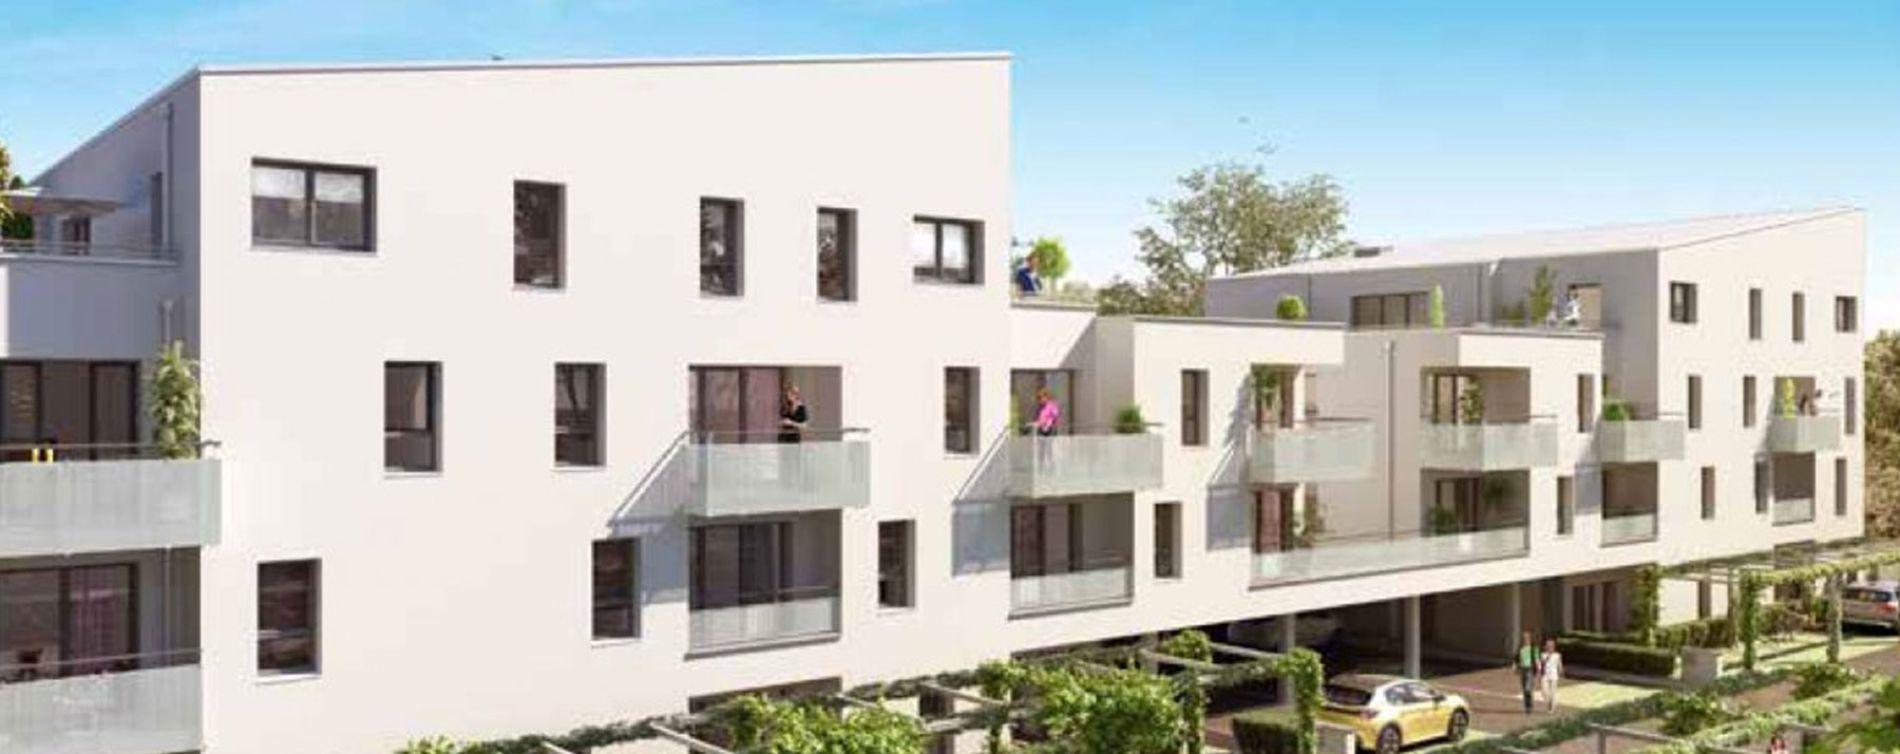 Le Havre : programme immobilier neuve « Grand Air »